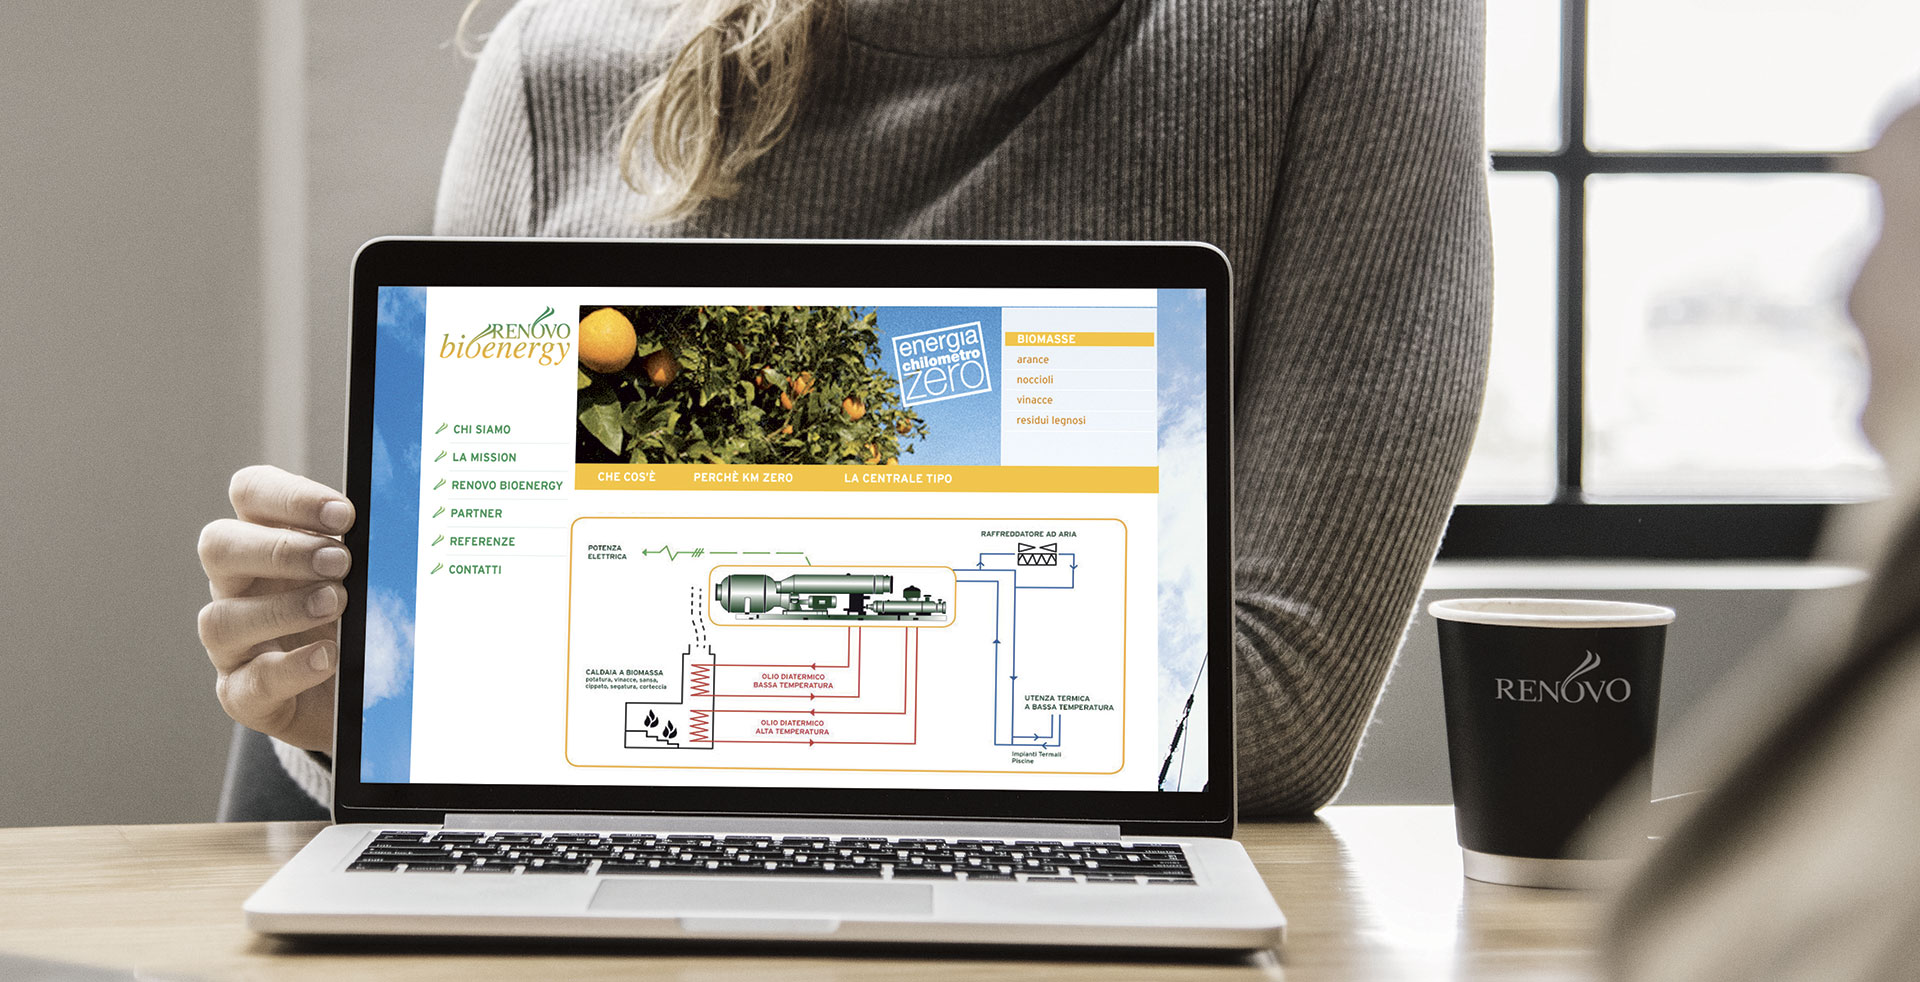 https://www.studiochiesa.it/wp-content/uploads/2020/07/SC-Studio-Chiesa-Communication_Energia-Ambiente-Renovo-Bioenergy-web-design.jpg